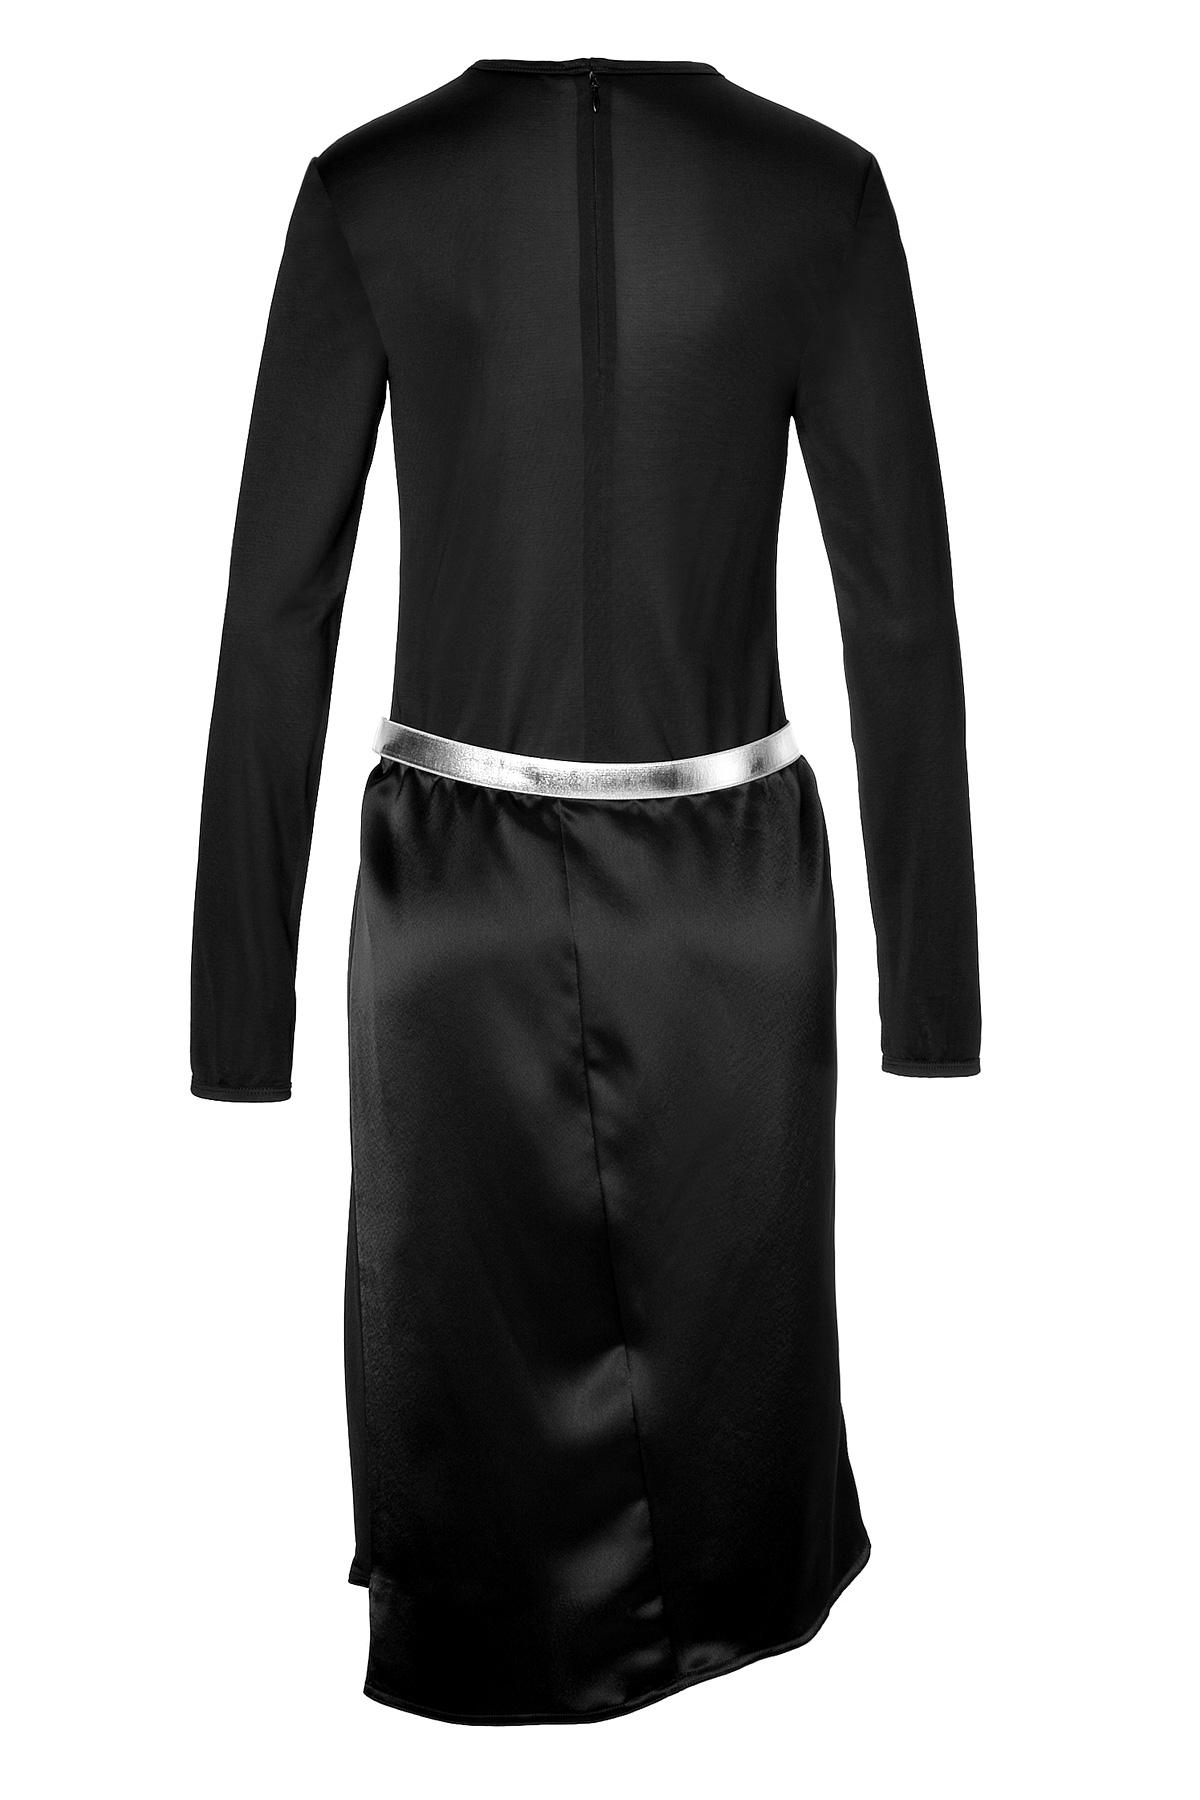 paco rabanne satin dress with metallic belt black in